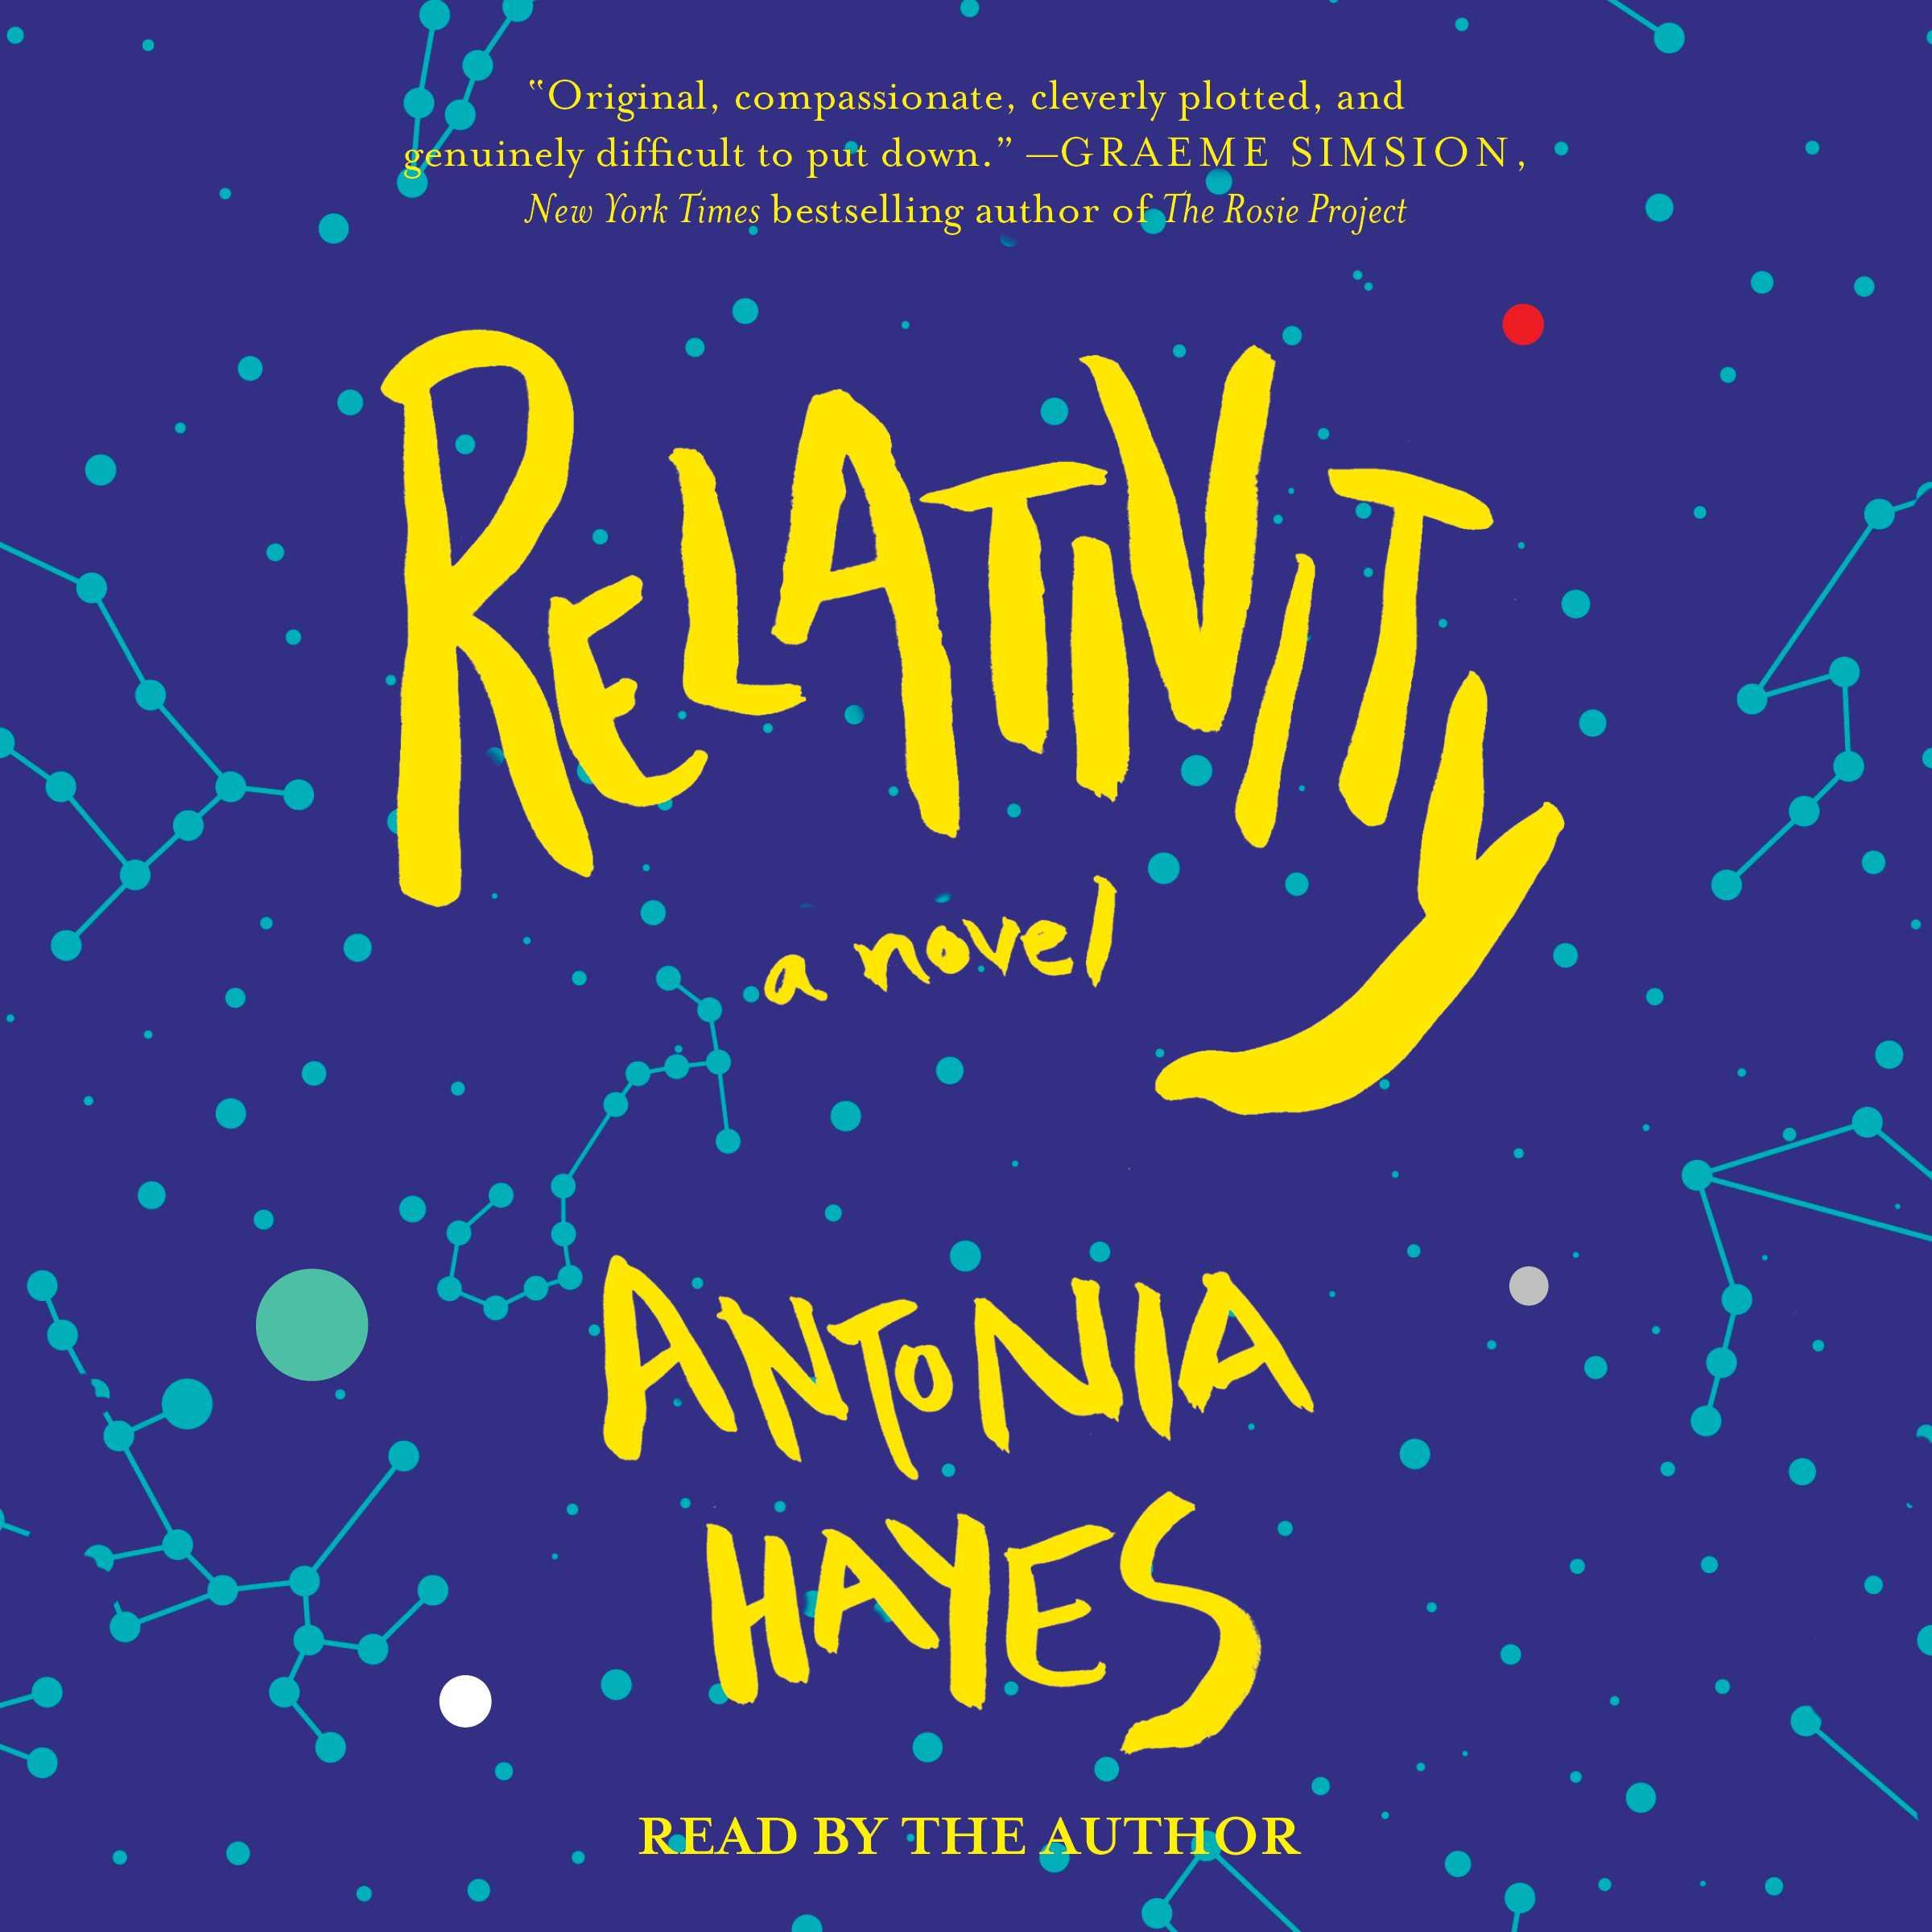 Relativity 9781442399570 hr